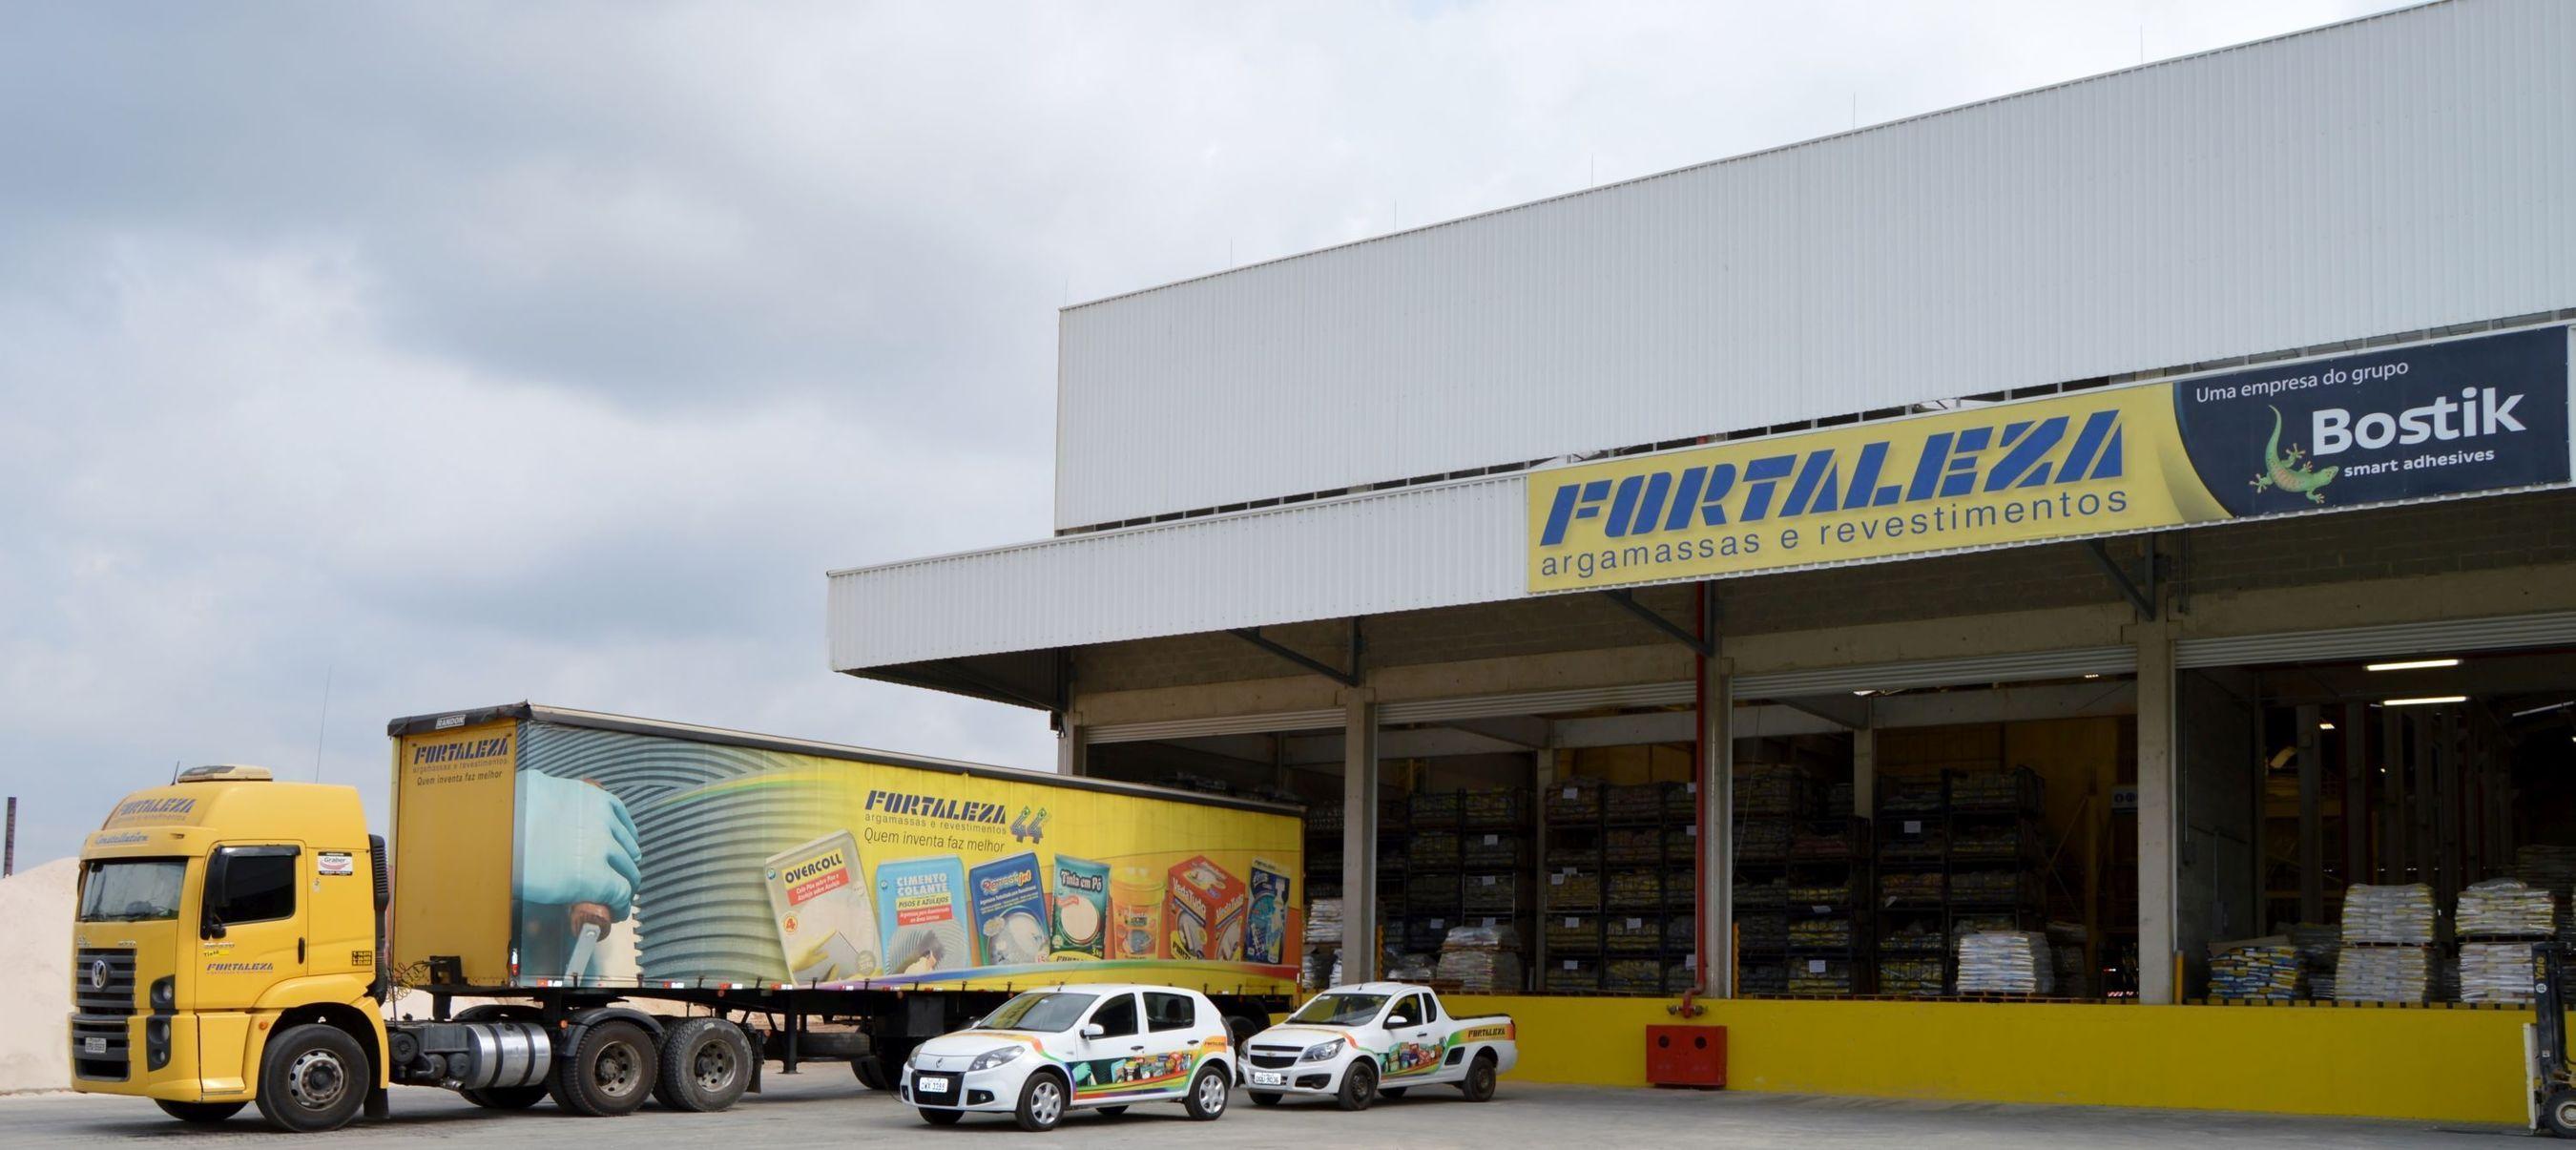 New Bostik powder manufacturing plant at Queimados in Brazil (PRNewsFoto/Bostik)